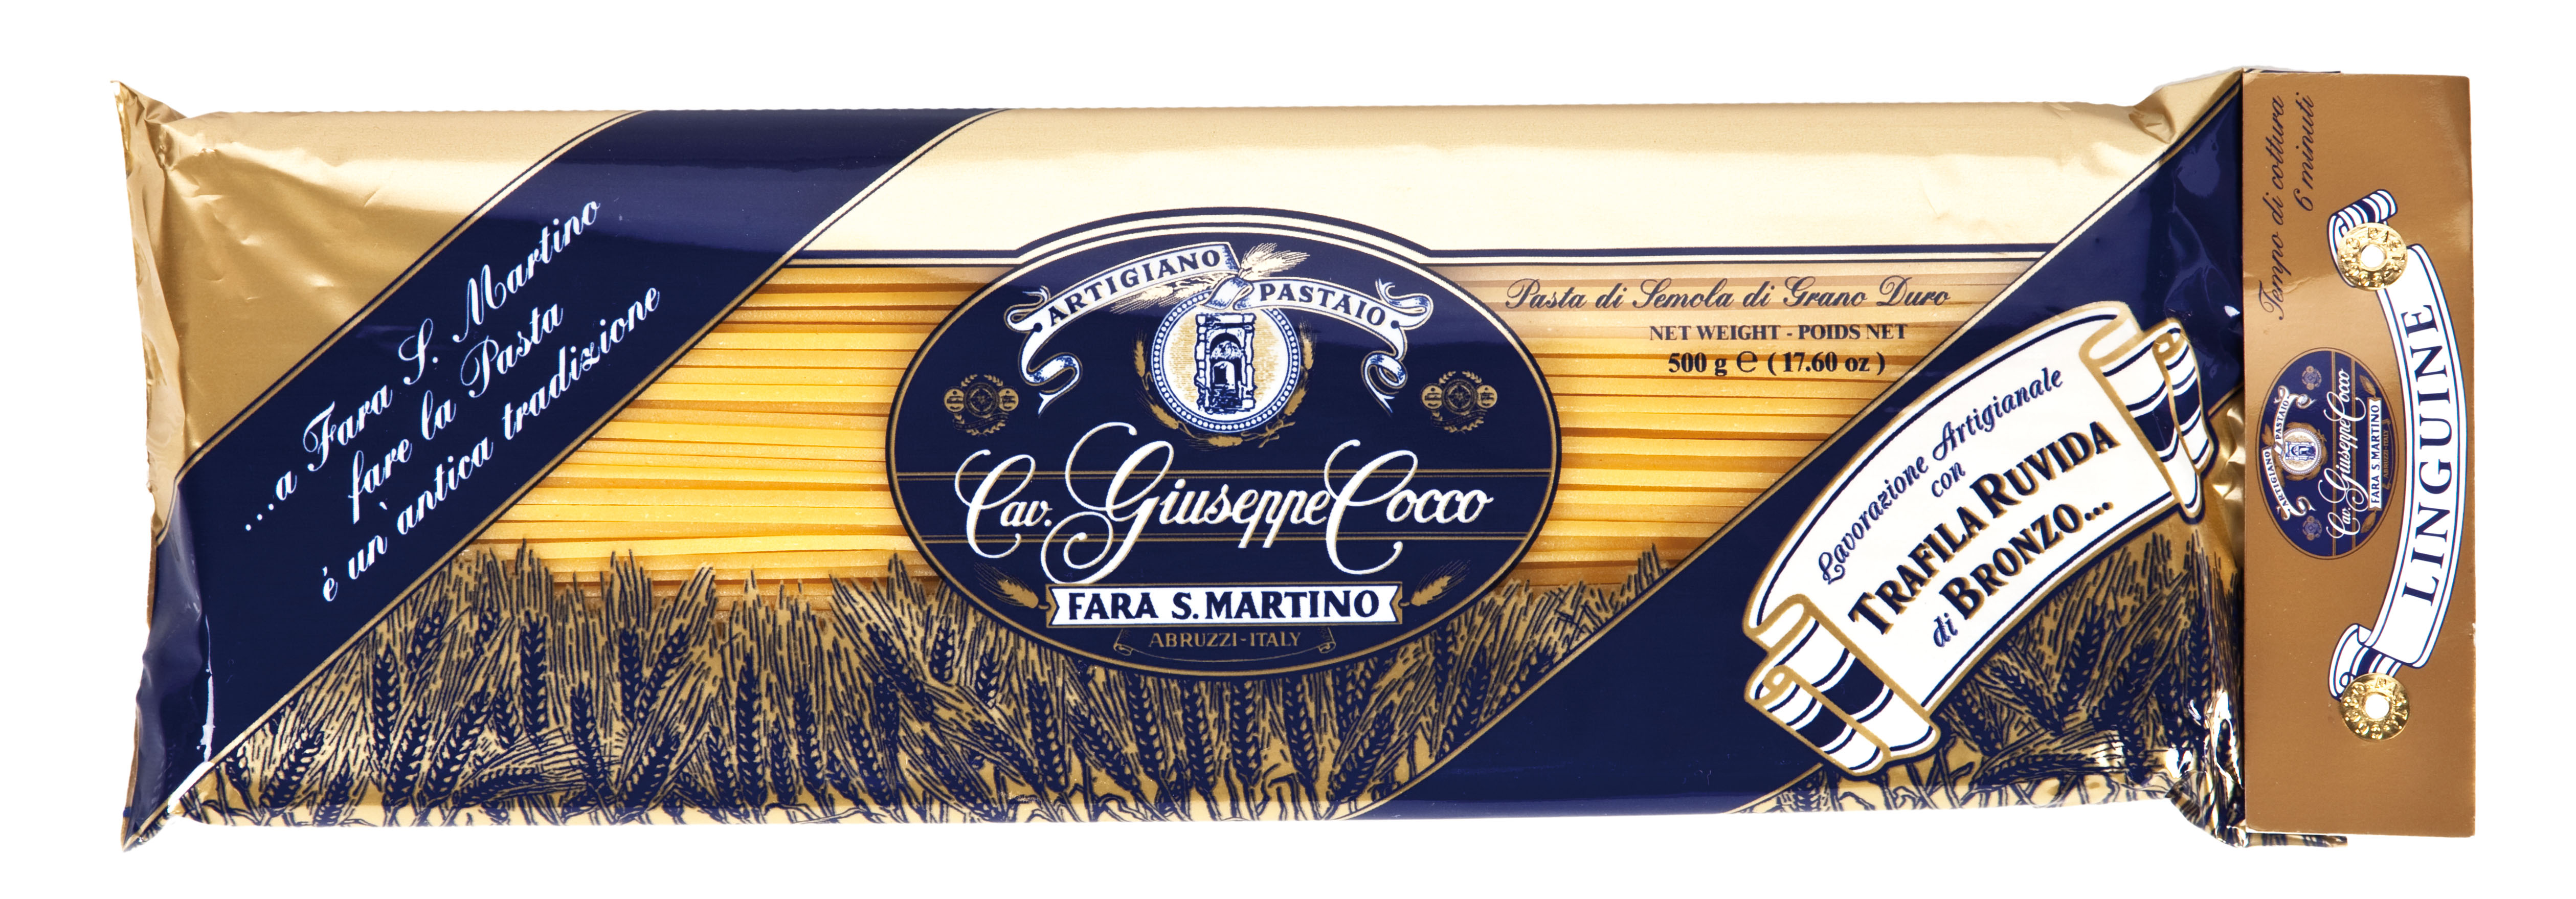 Linguine Nr.34 500 g Packung Cocco